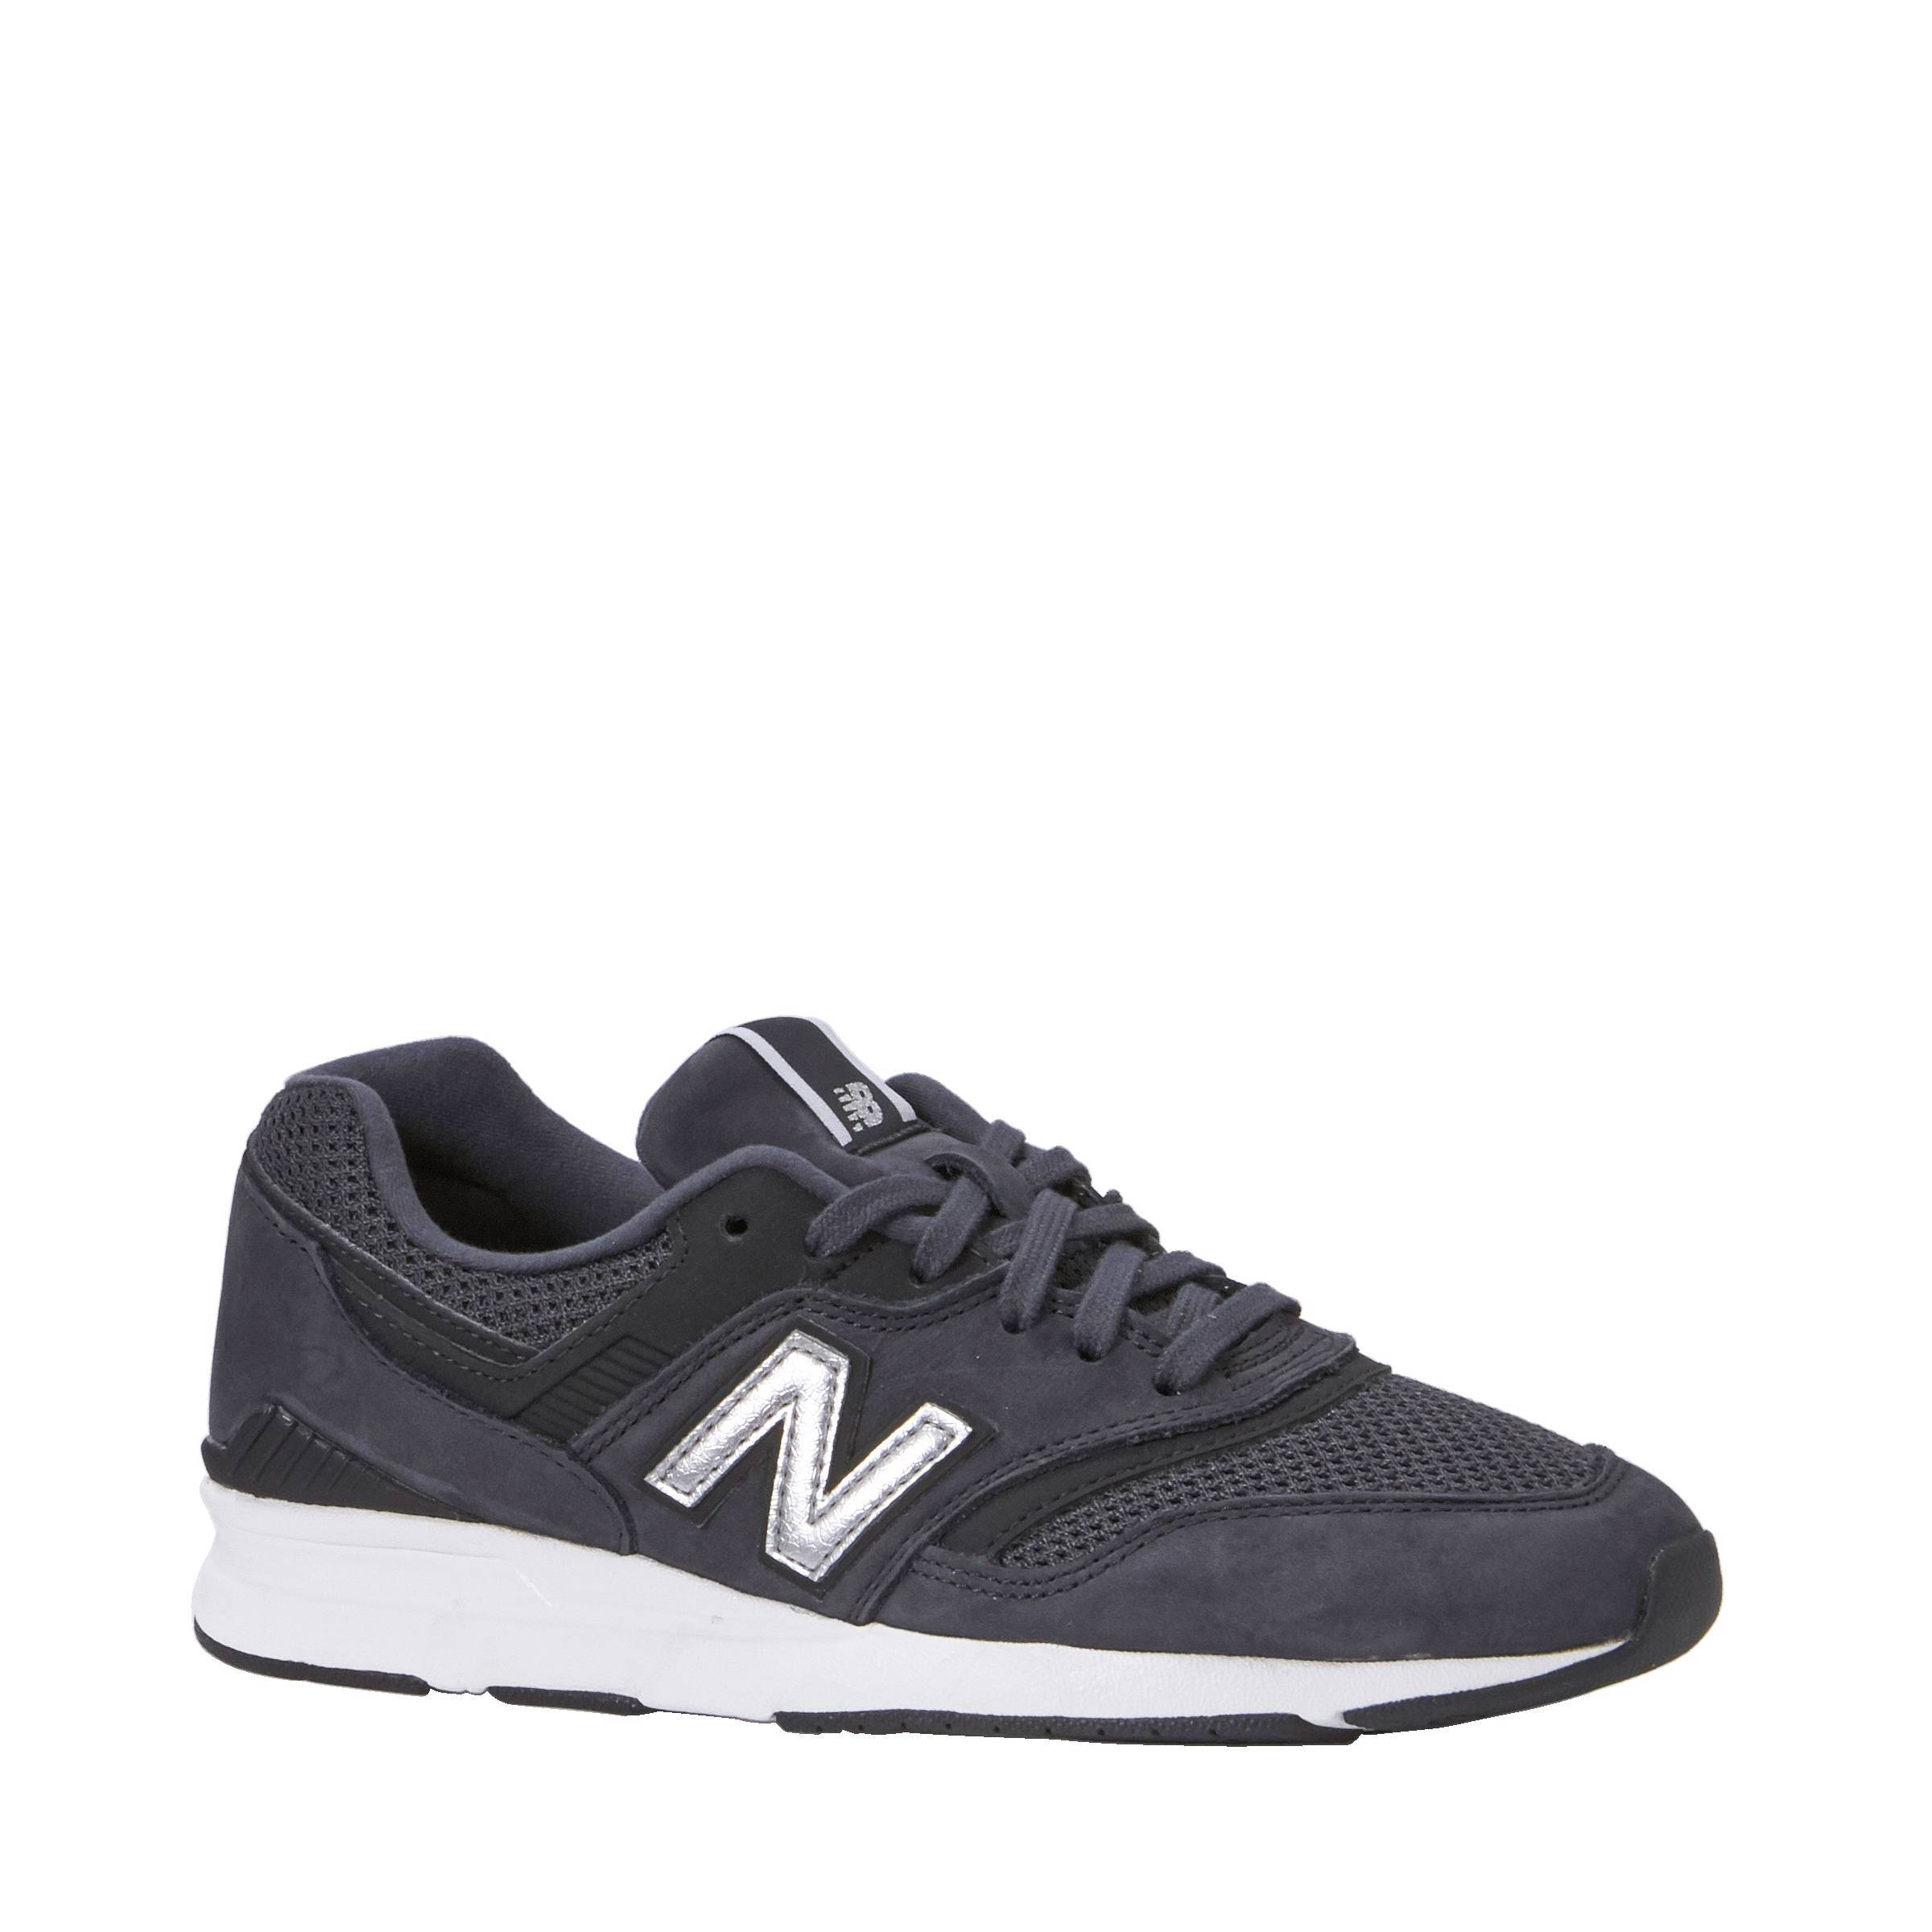 new balance schoenen vallen